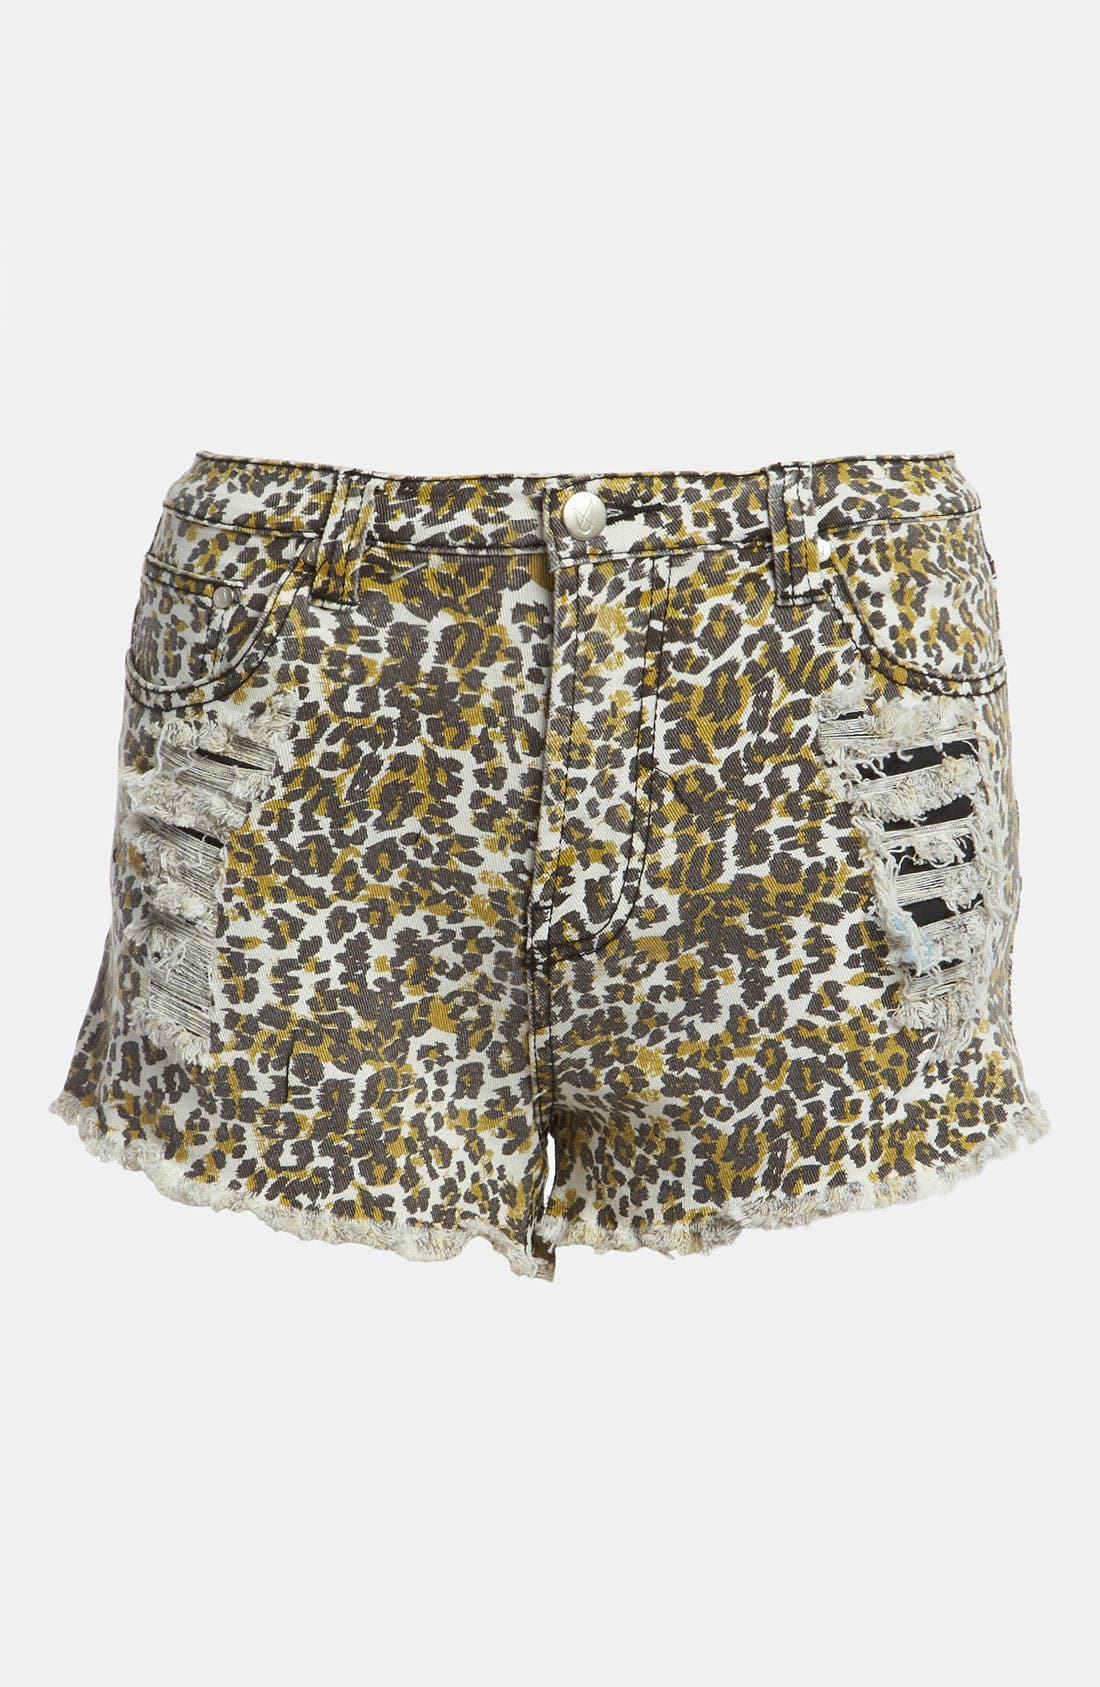 Alternate Image 1 Selected - MINKPINK 'Runaway Leopard' Slash Shorts